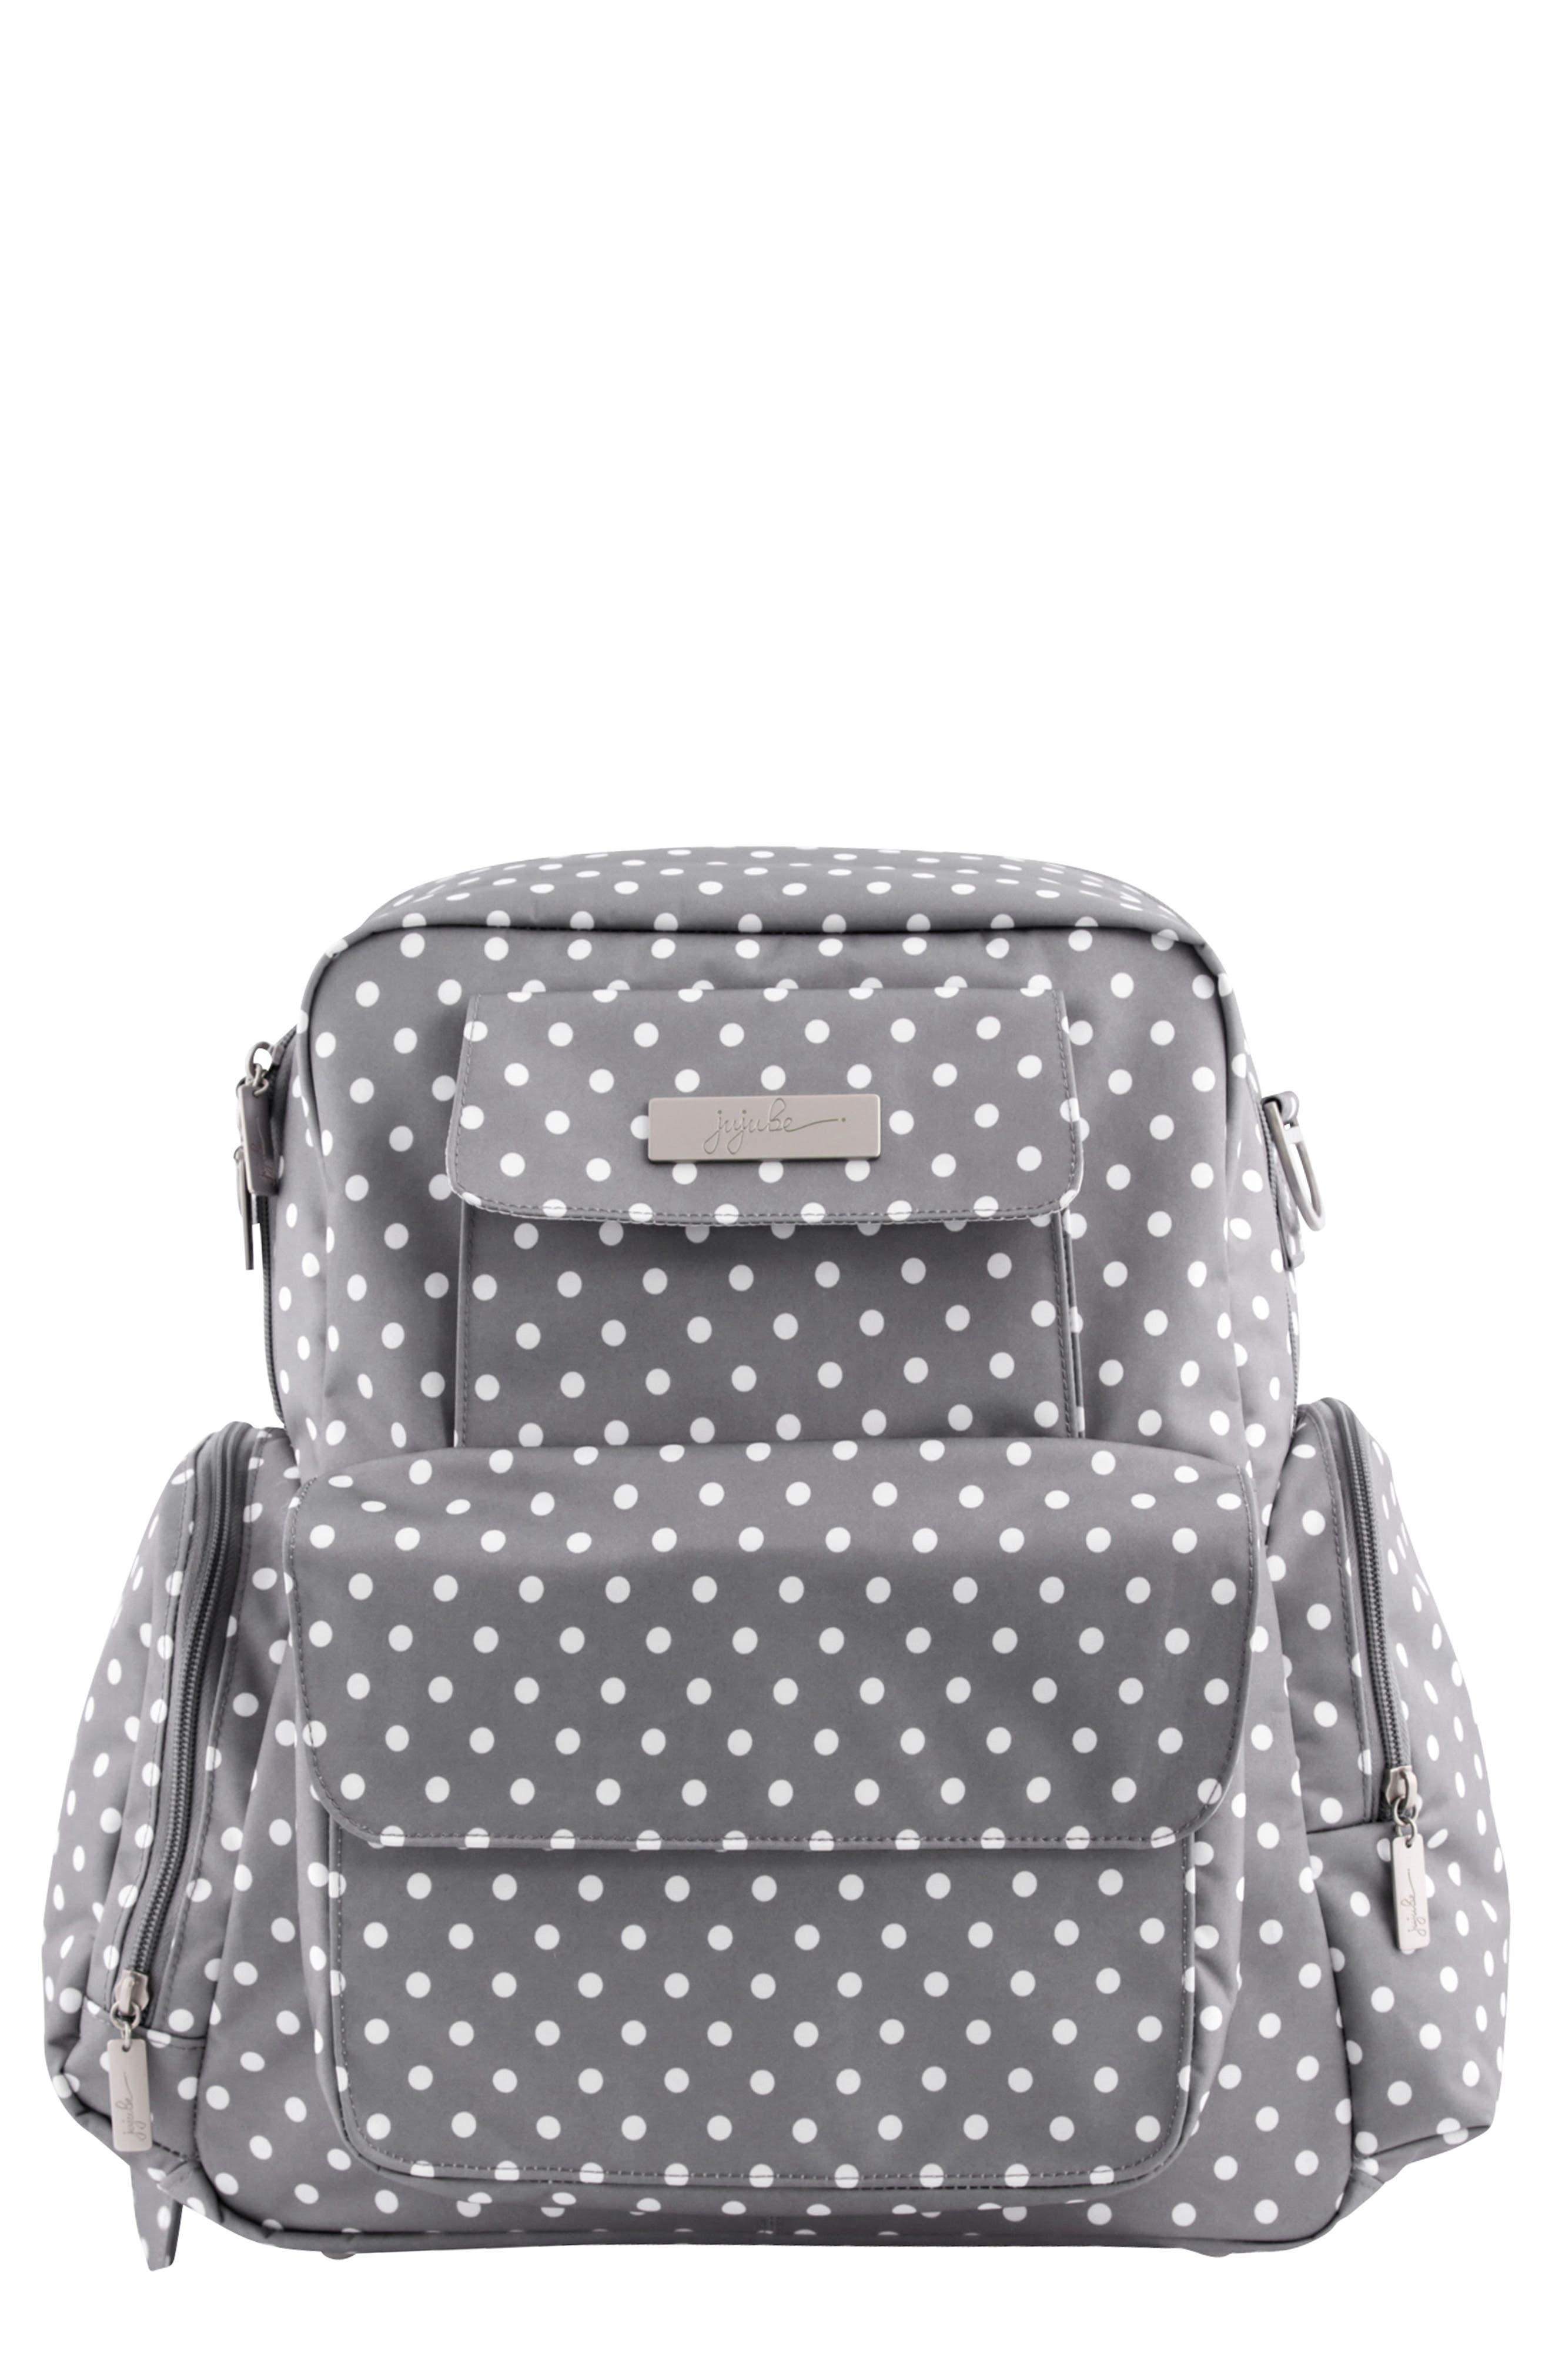 Be Nurtured Pumping Backpack,                         Main,                         color, 020